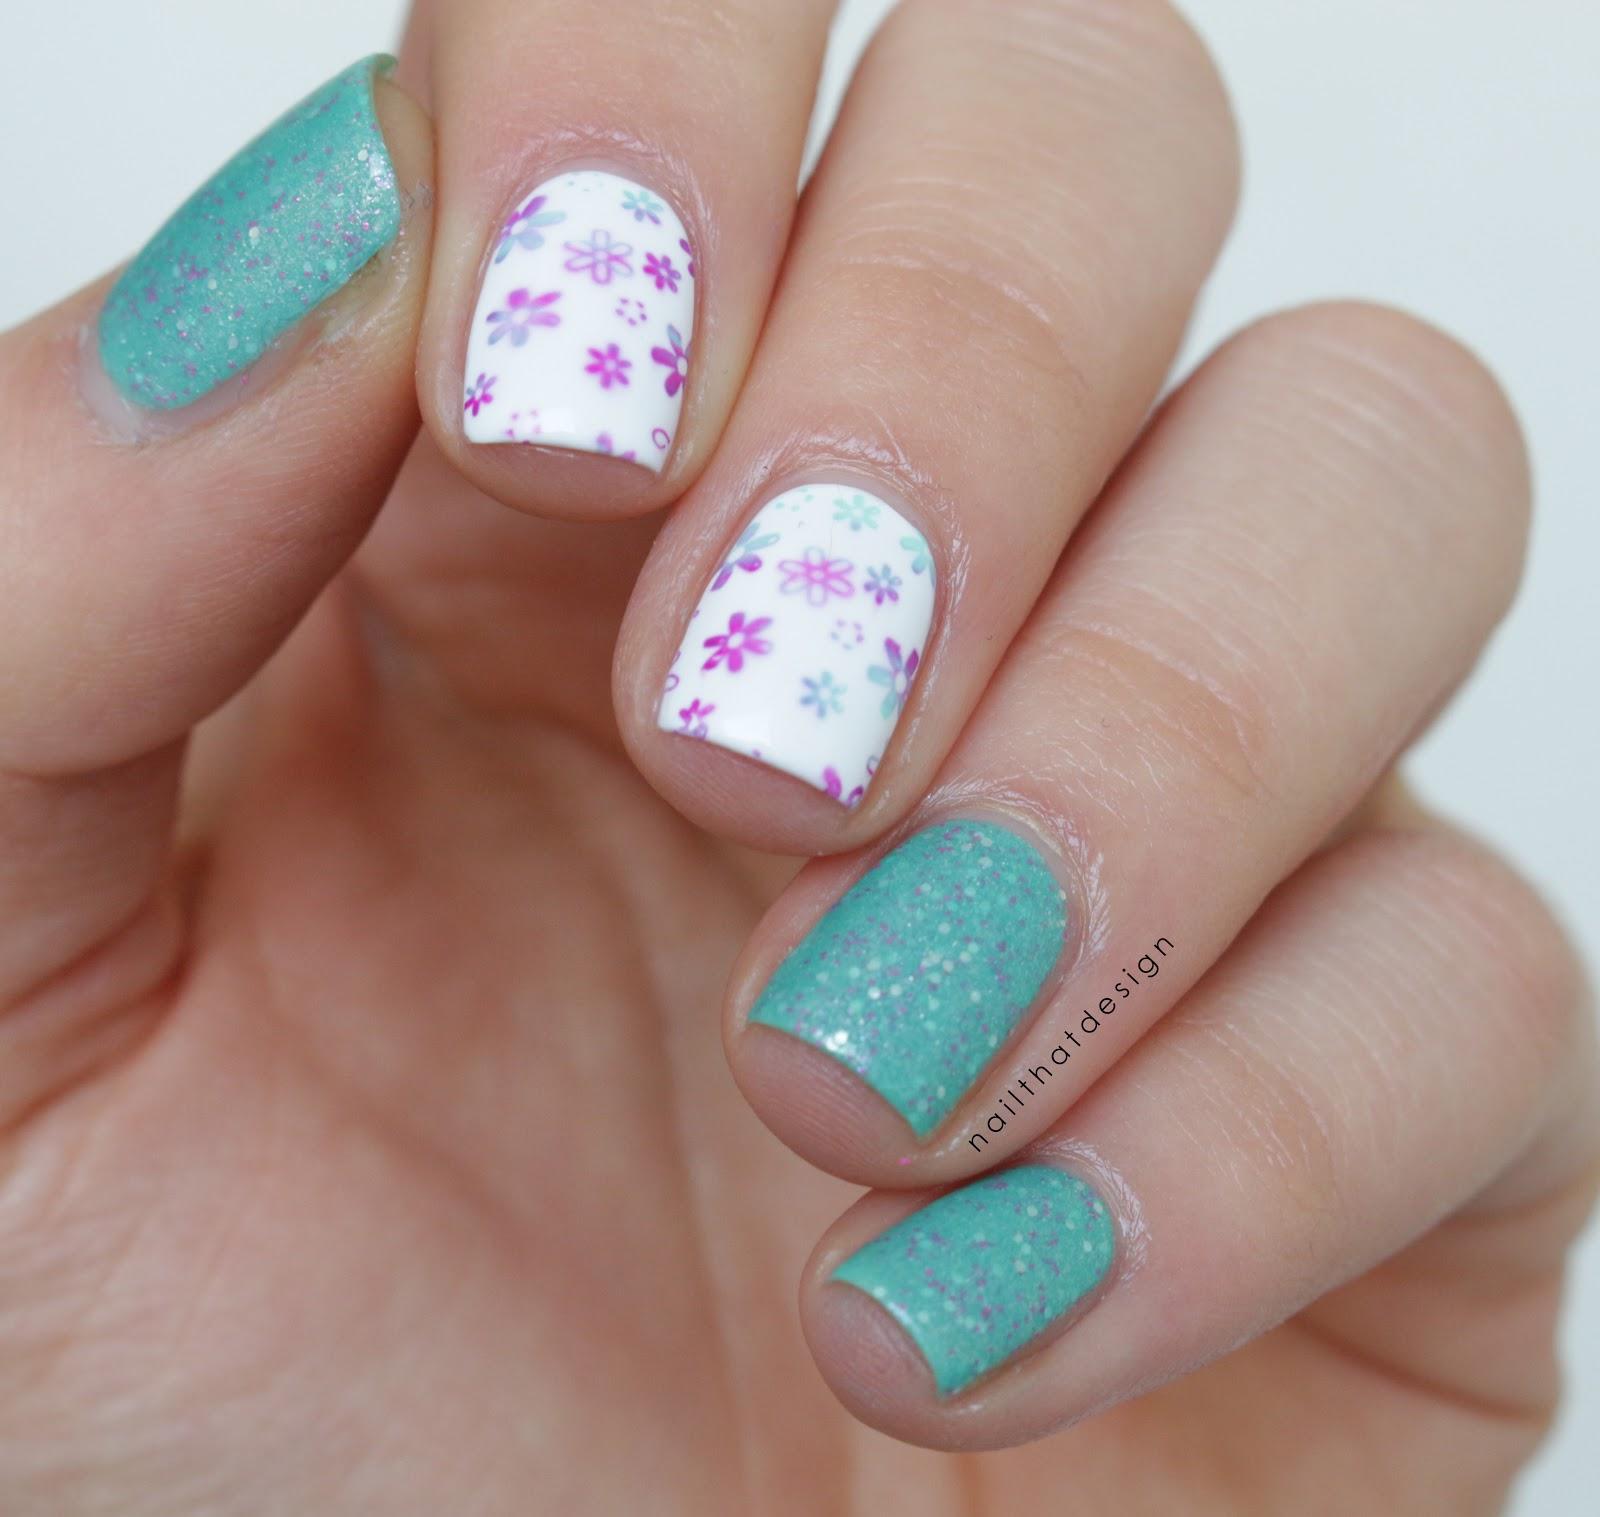 Q Riouser Q Riouser Nail Art: Guest Post From Nail That Design